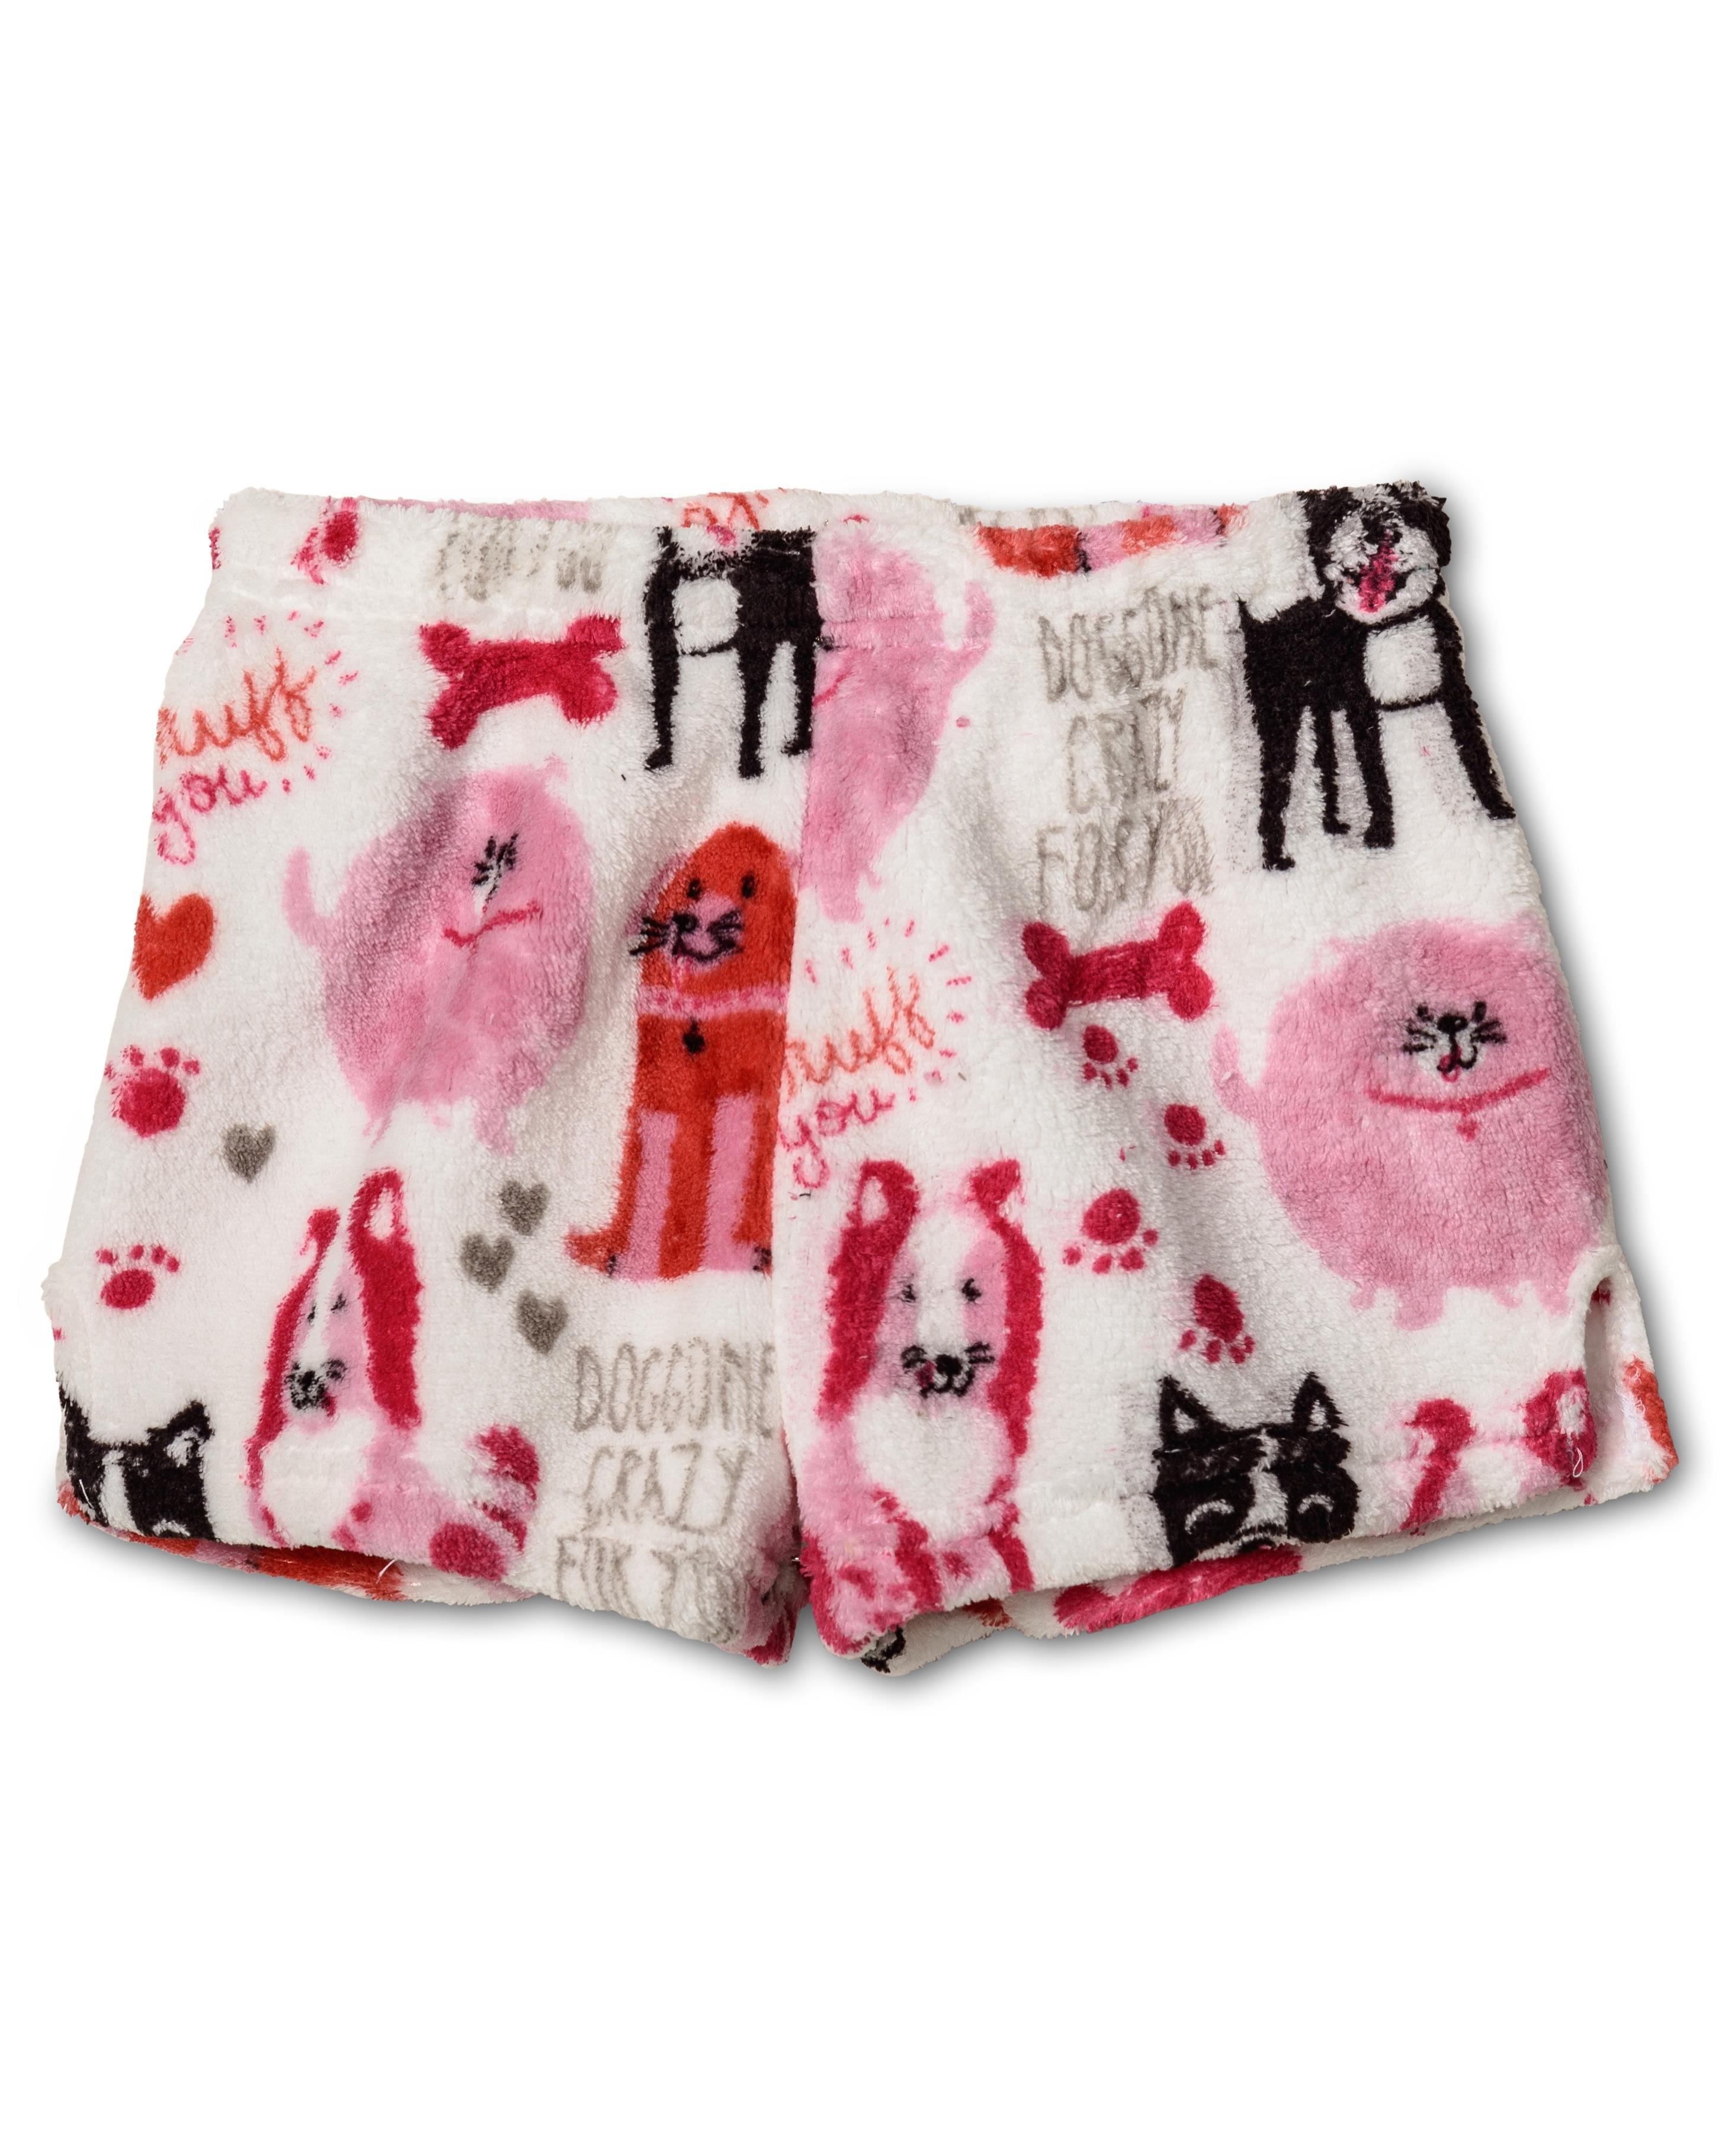 18c9adac93 Up Past 8 - Up Past 8 Plush Pajamas shorts for Girls